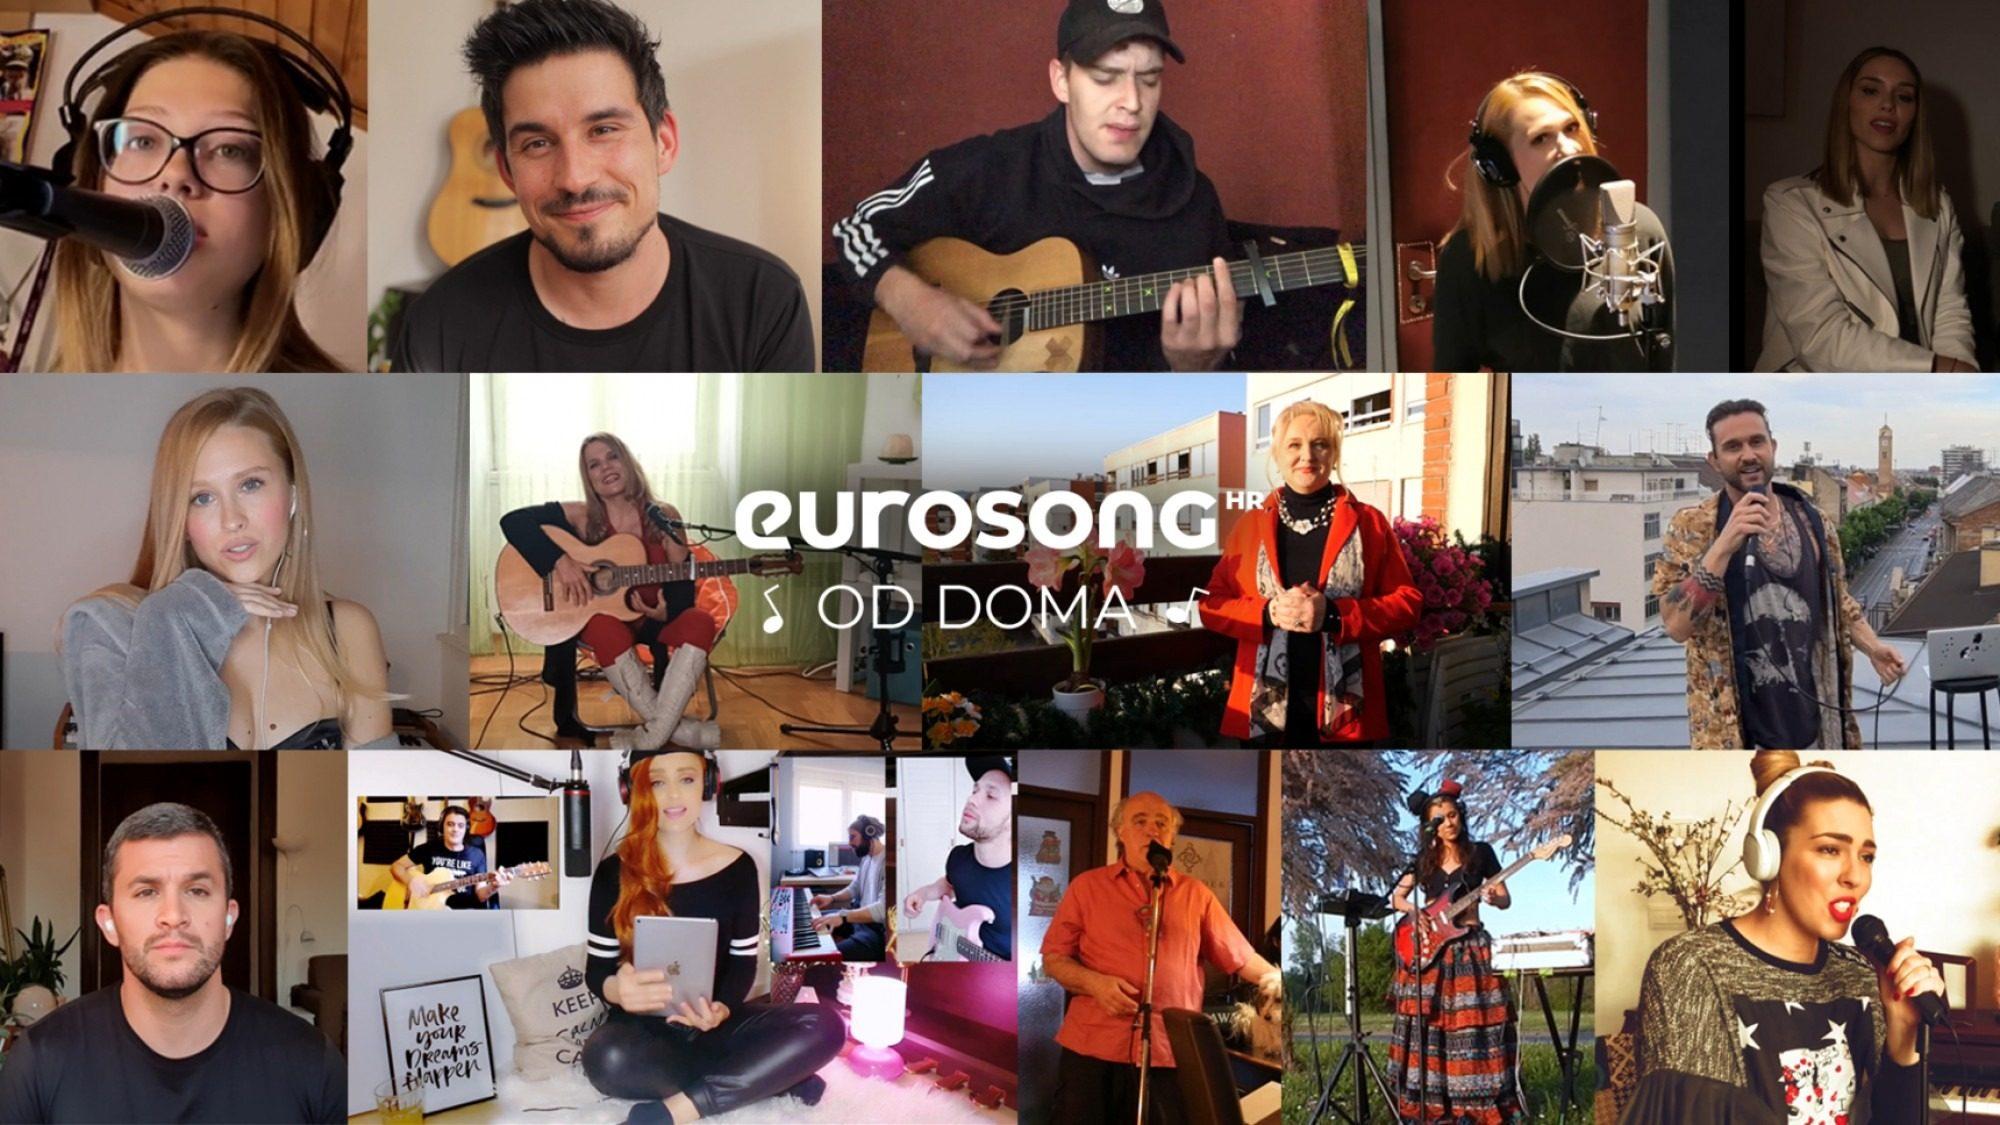 07052020_053848_Eurosong_od_doma_participants_grande